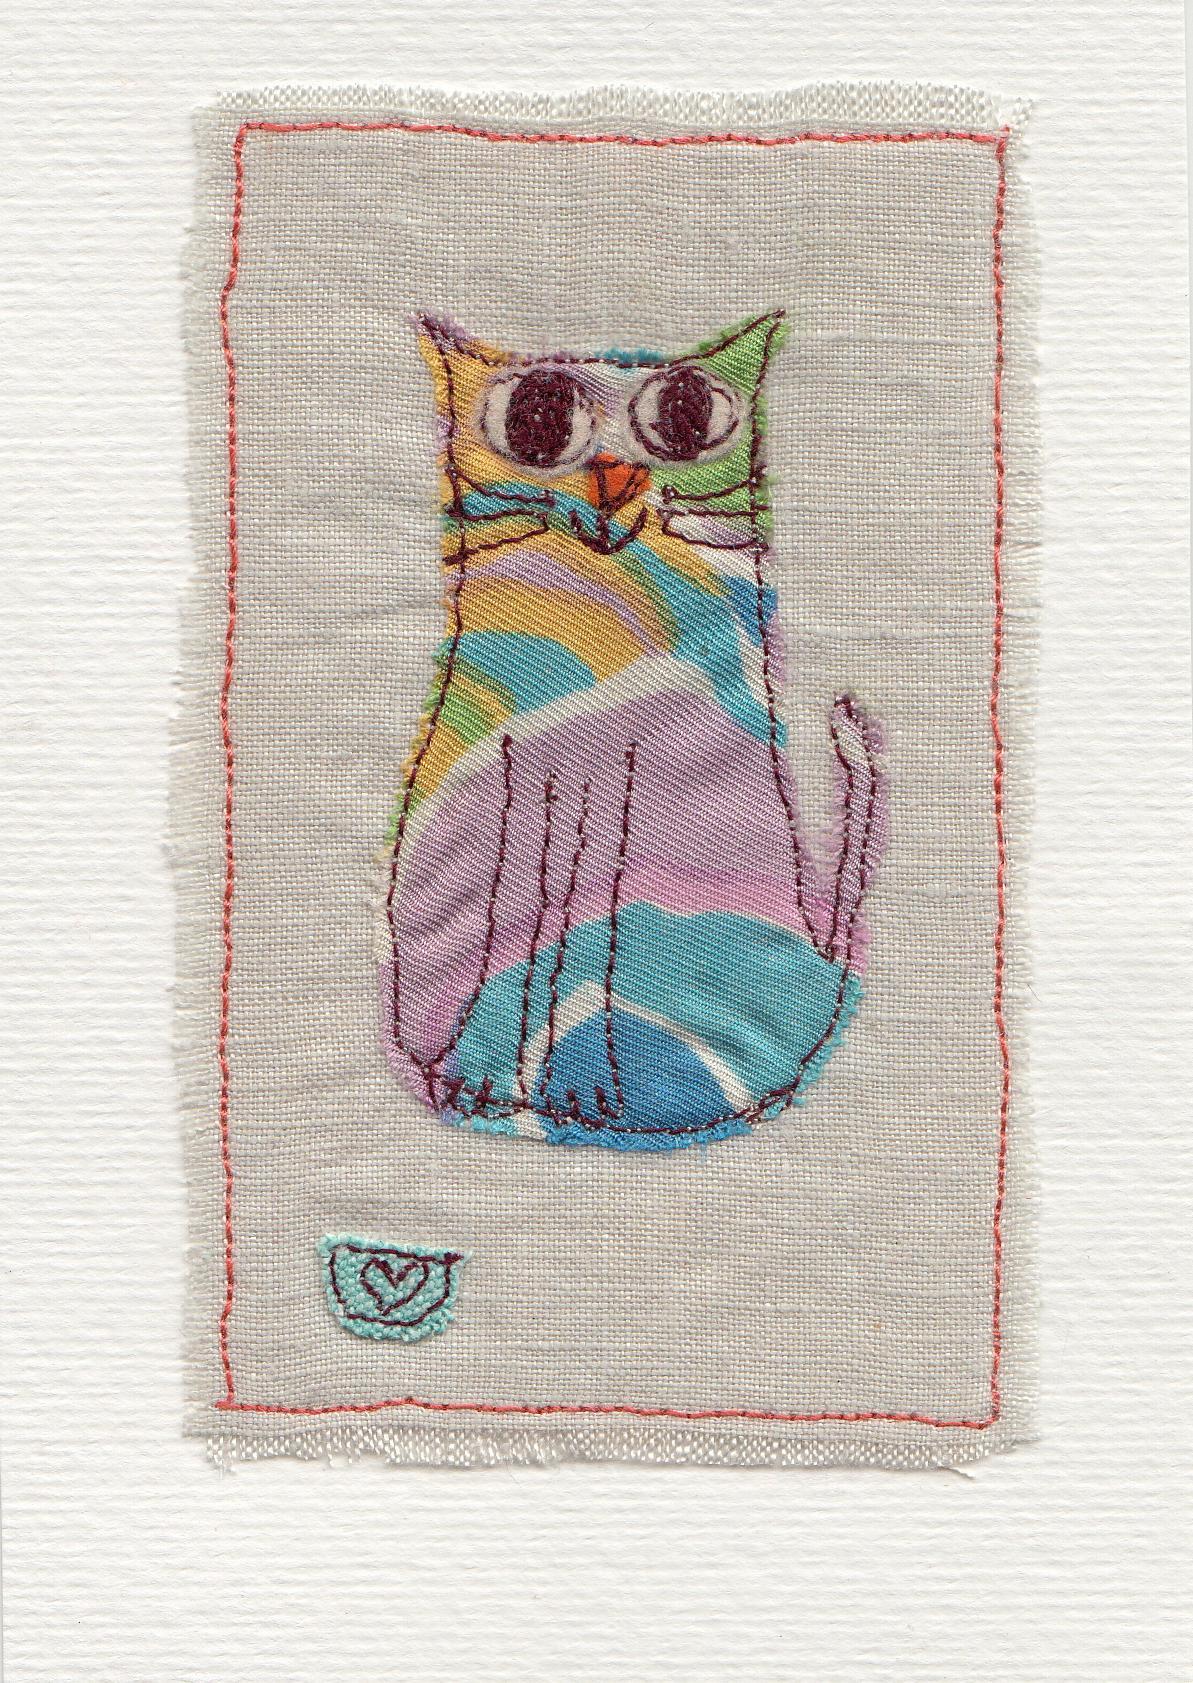 Free machine embroidery with Dawn Ireland